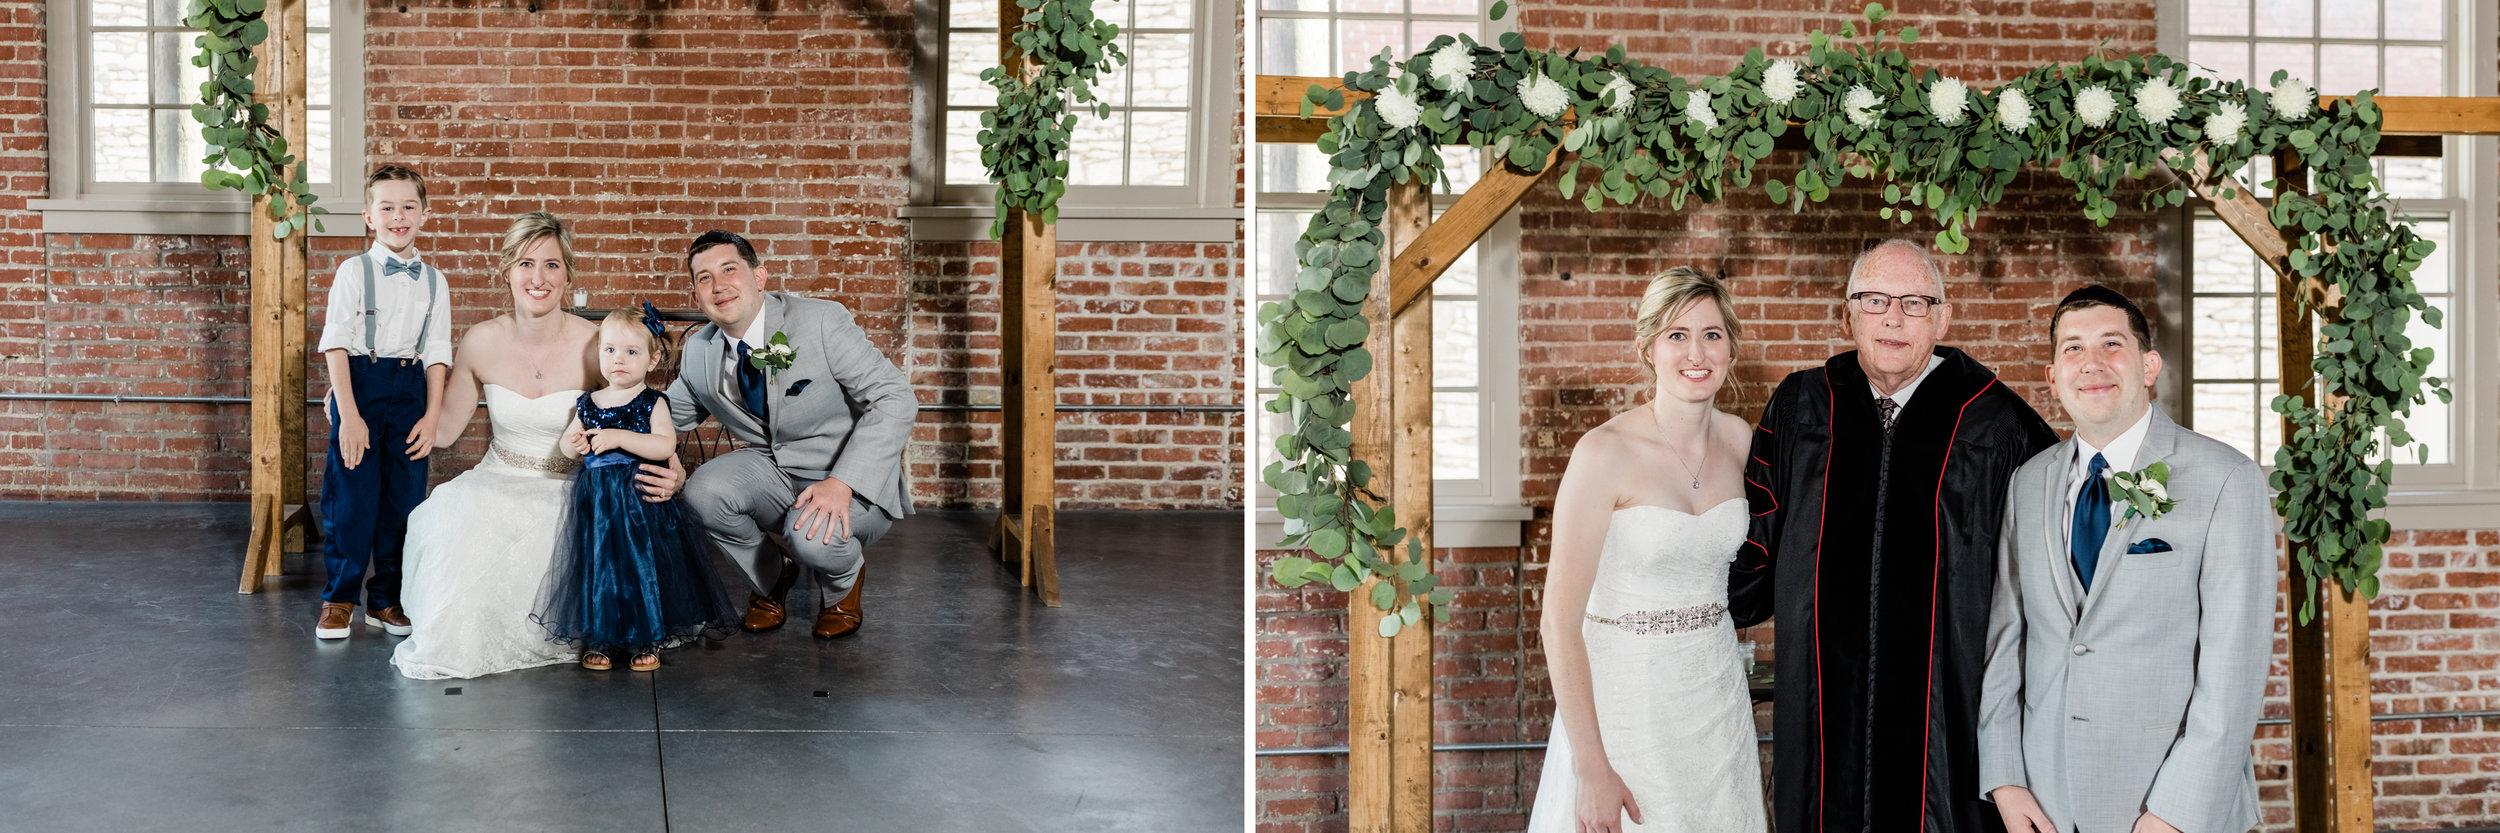 Kansas City Wedding Photographer 12.jpg